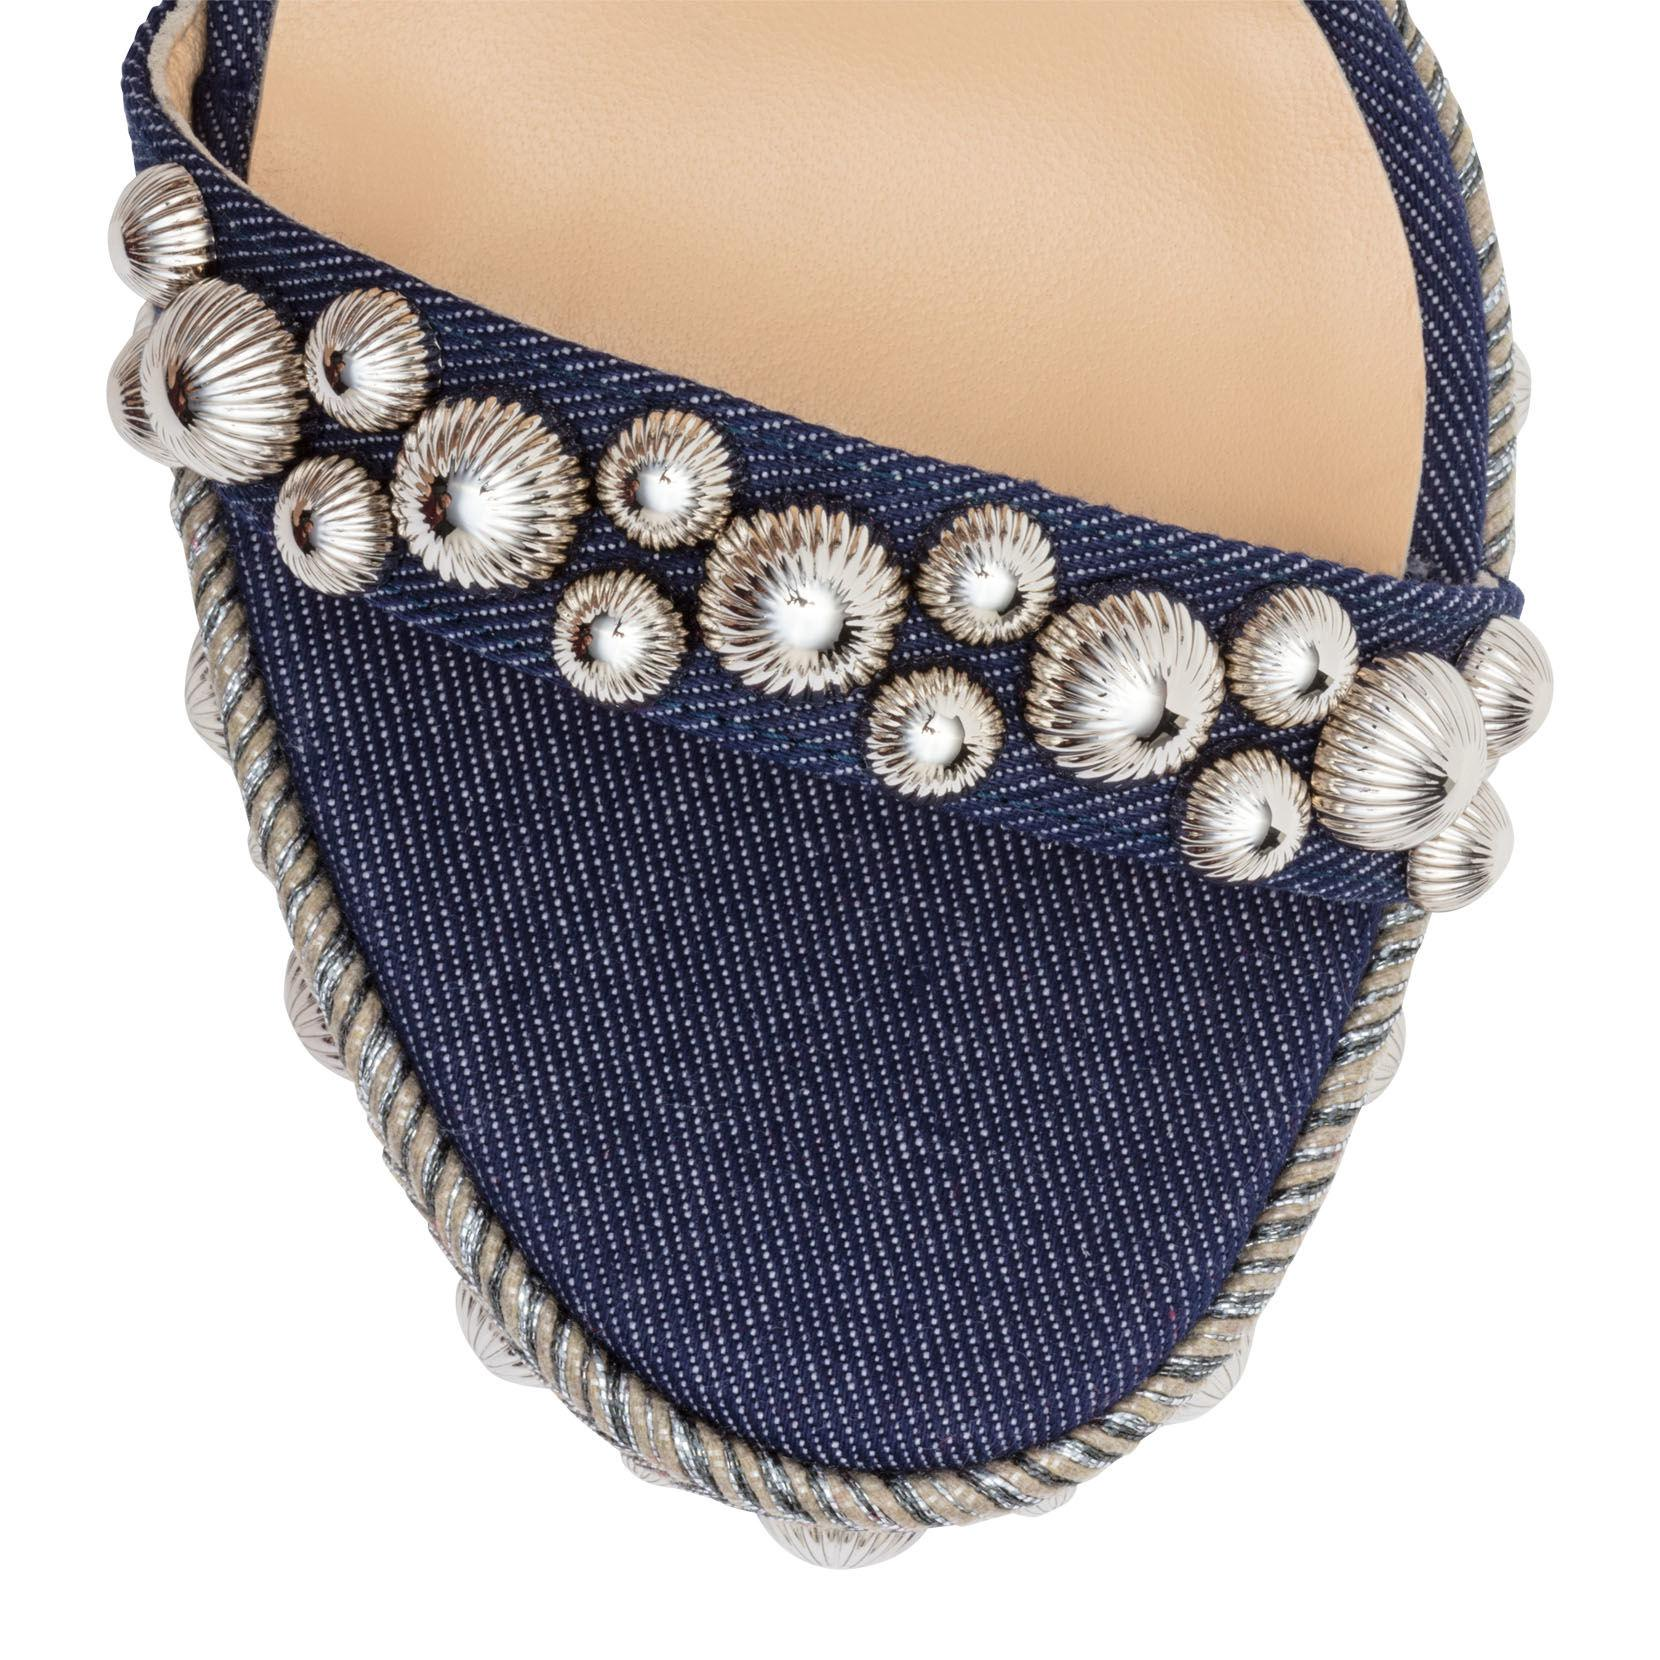 1b48a787352 Christian Louboutin - Rondaclou 120 Blue Denim Wedge Sandals - Lyst. View  fullscreen